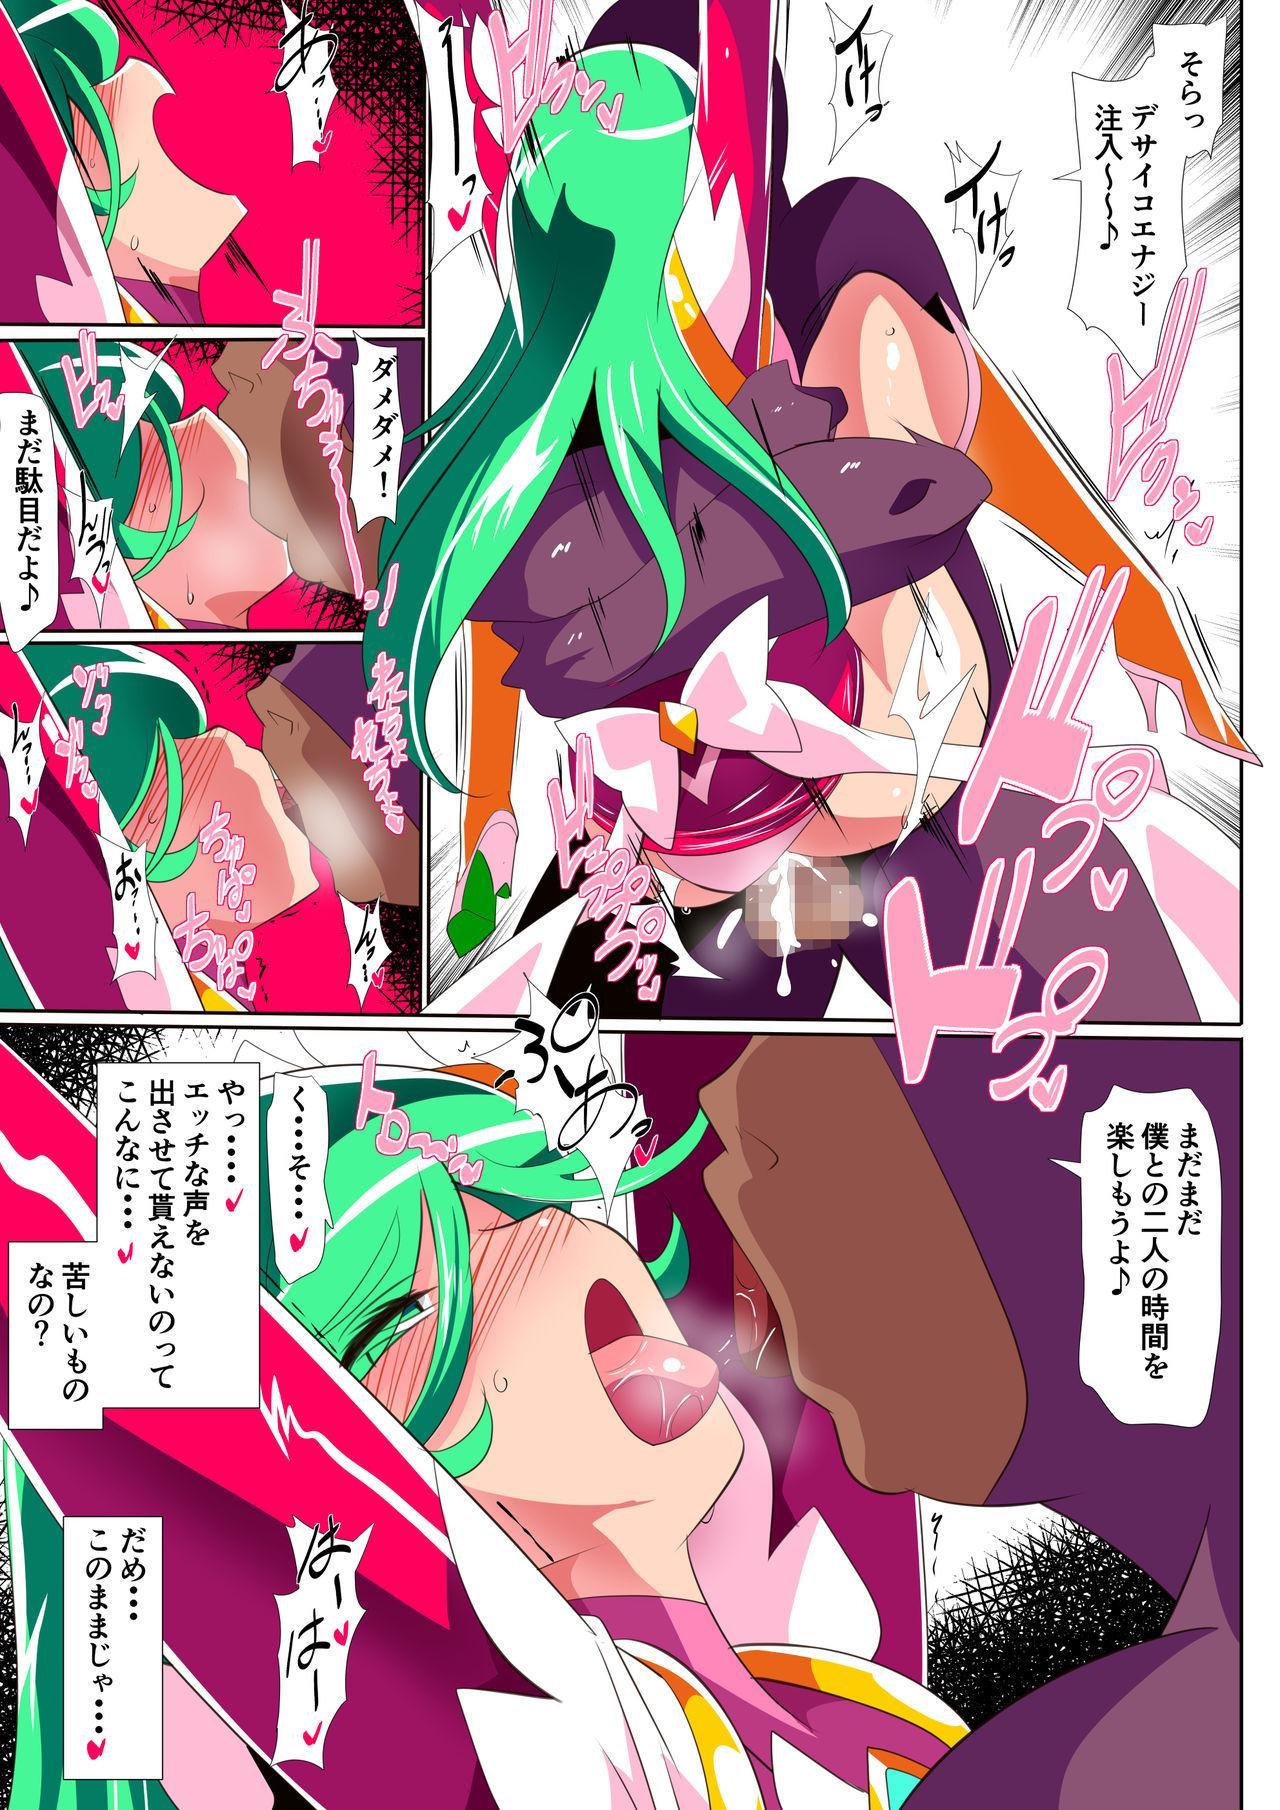 HEROINE LOSE2 サイコレディー・ミーティア編 20